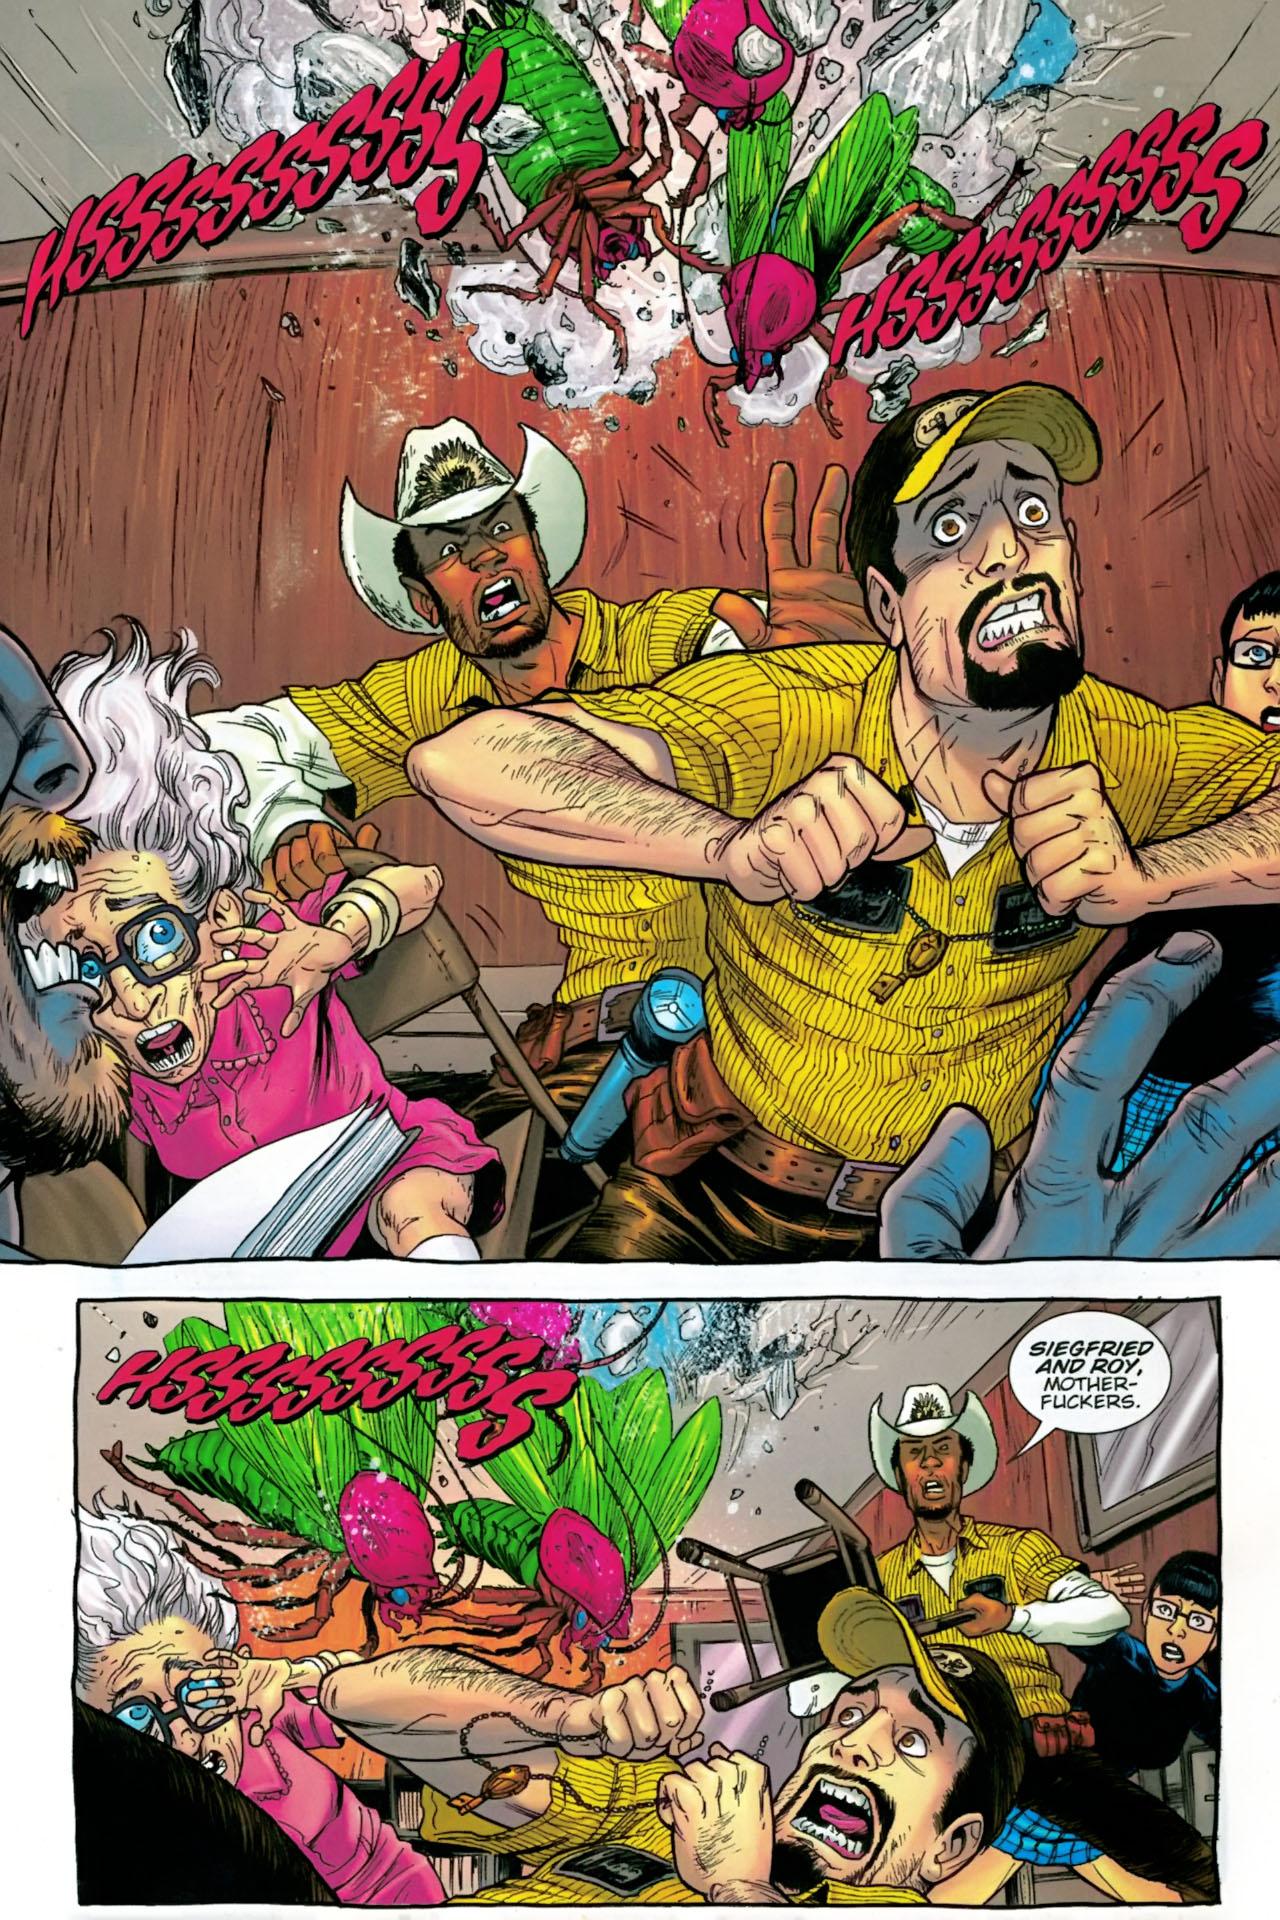 Read online The Exterminators comic -  Issue #28 - 9